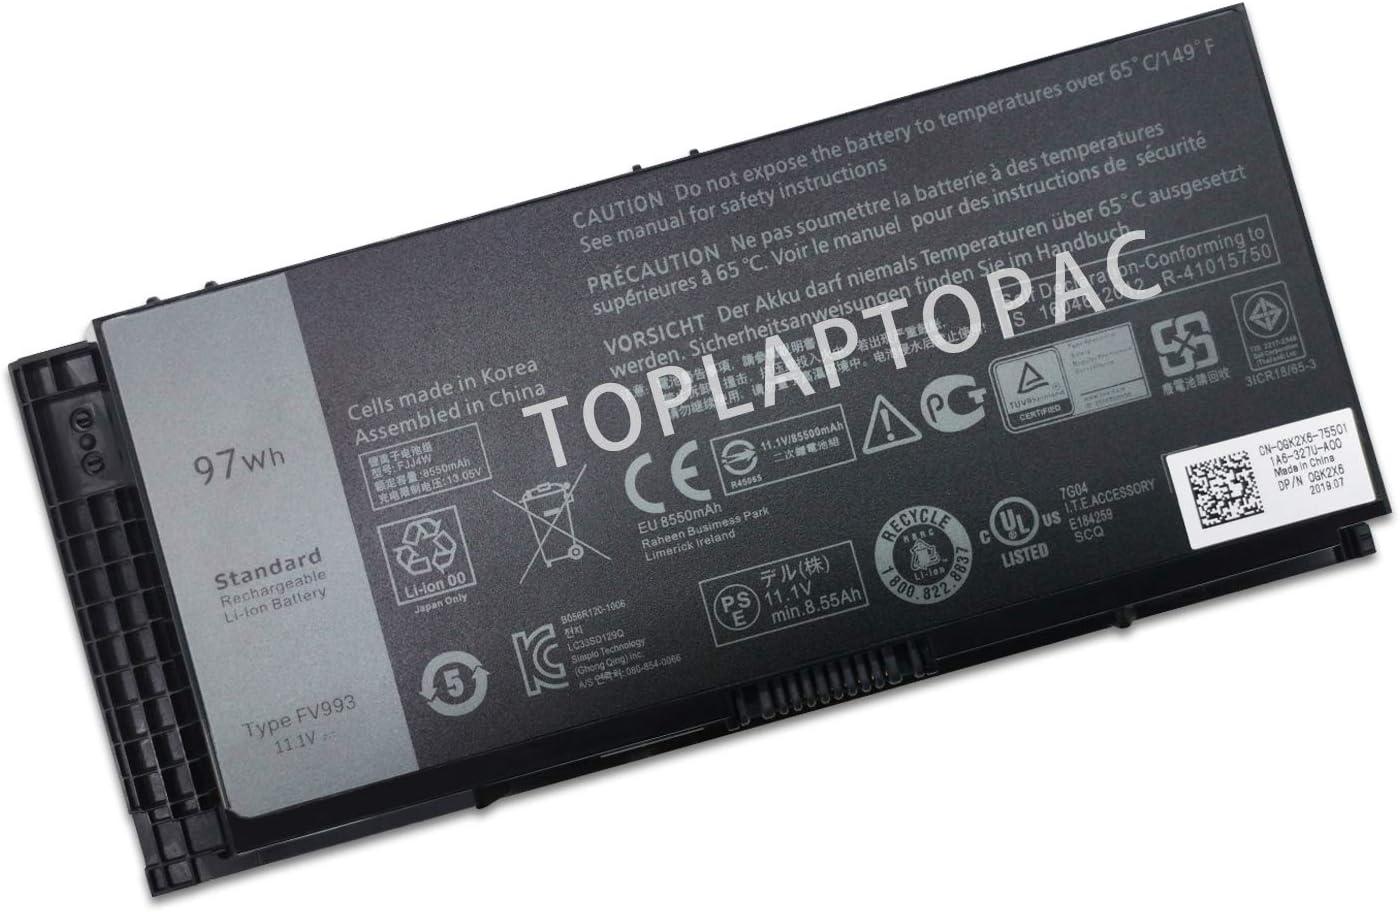 New 11.1V 97Wh FV993 Laptop Battery Compatible with Dell Precision M4600 M4800 M6600 M6800 FJJ4W PG6RC 7DWMT JHYP2 K4RDX